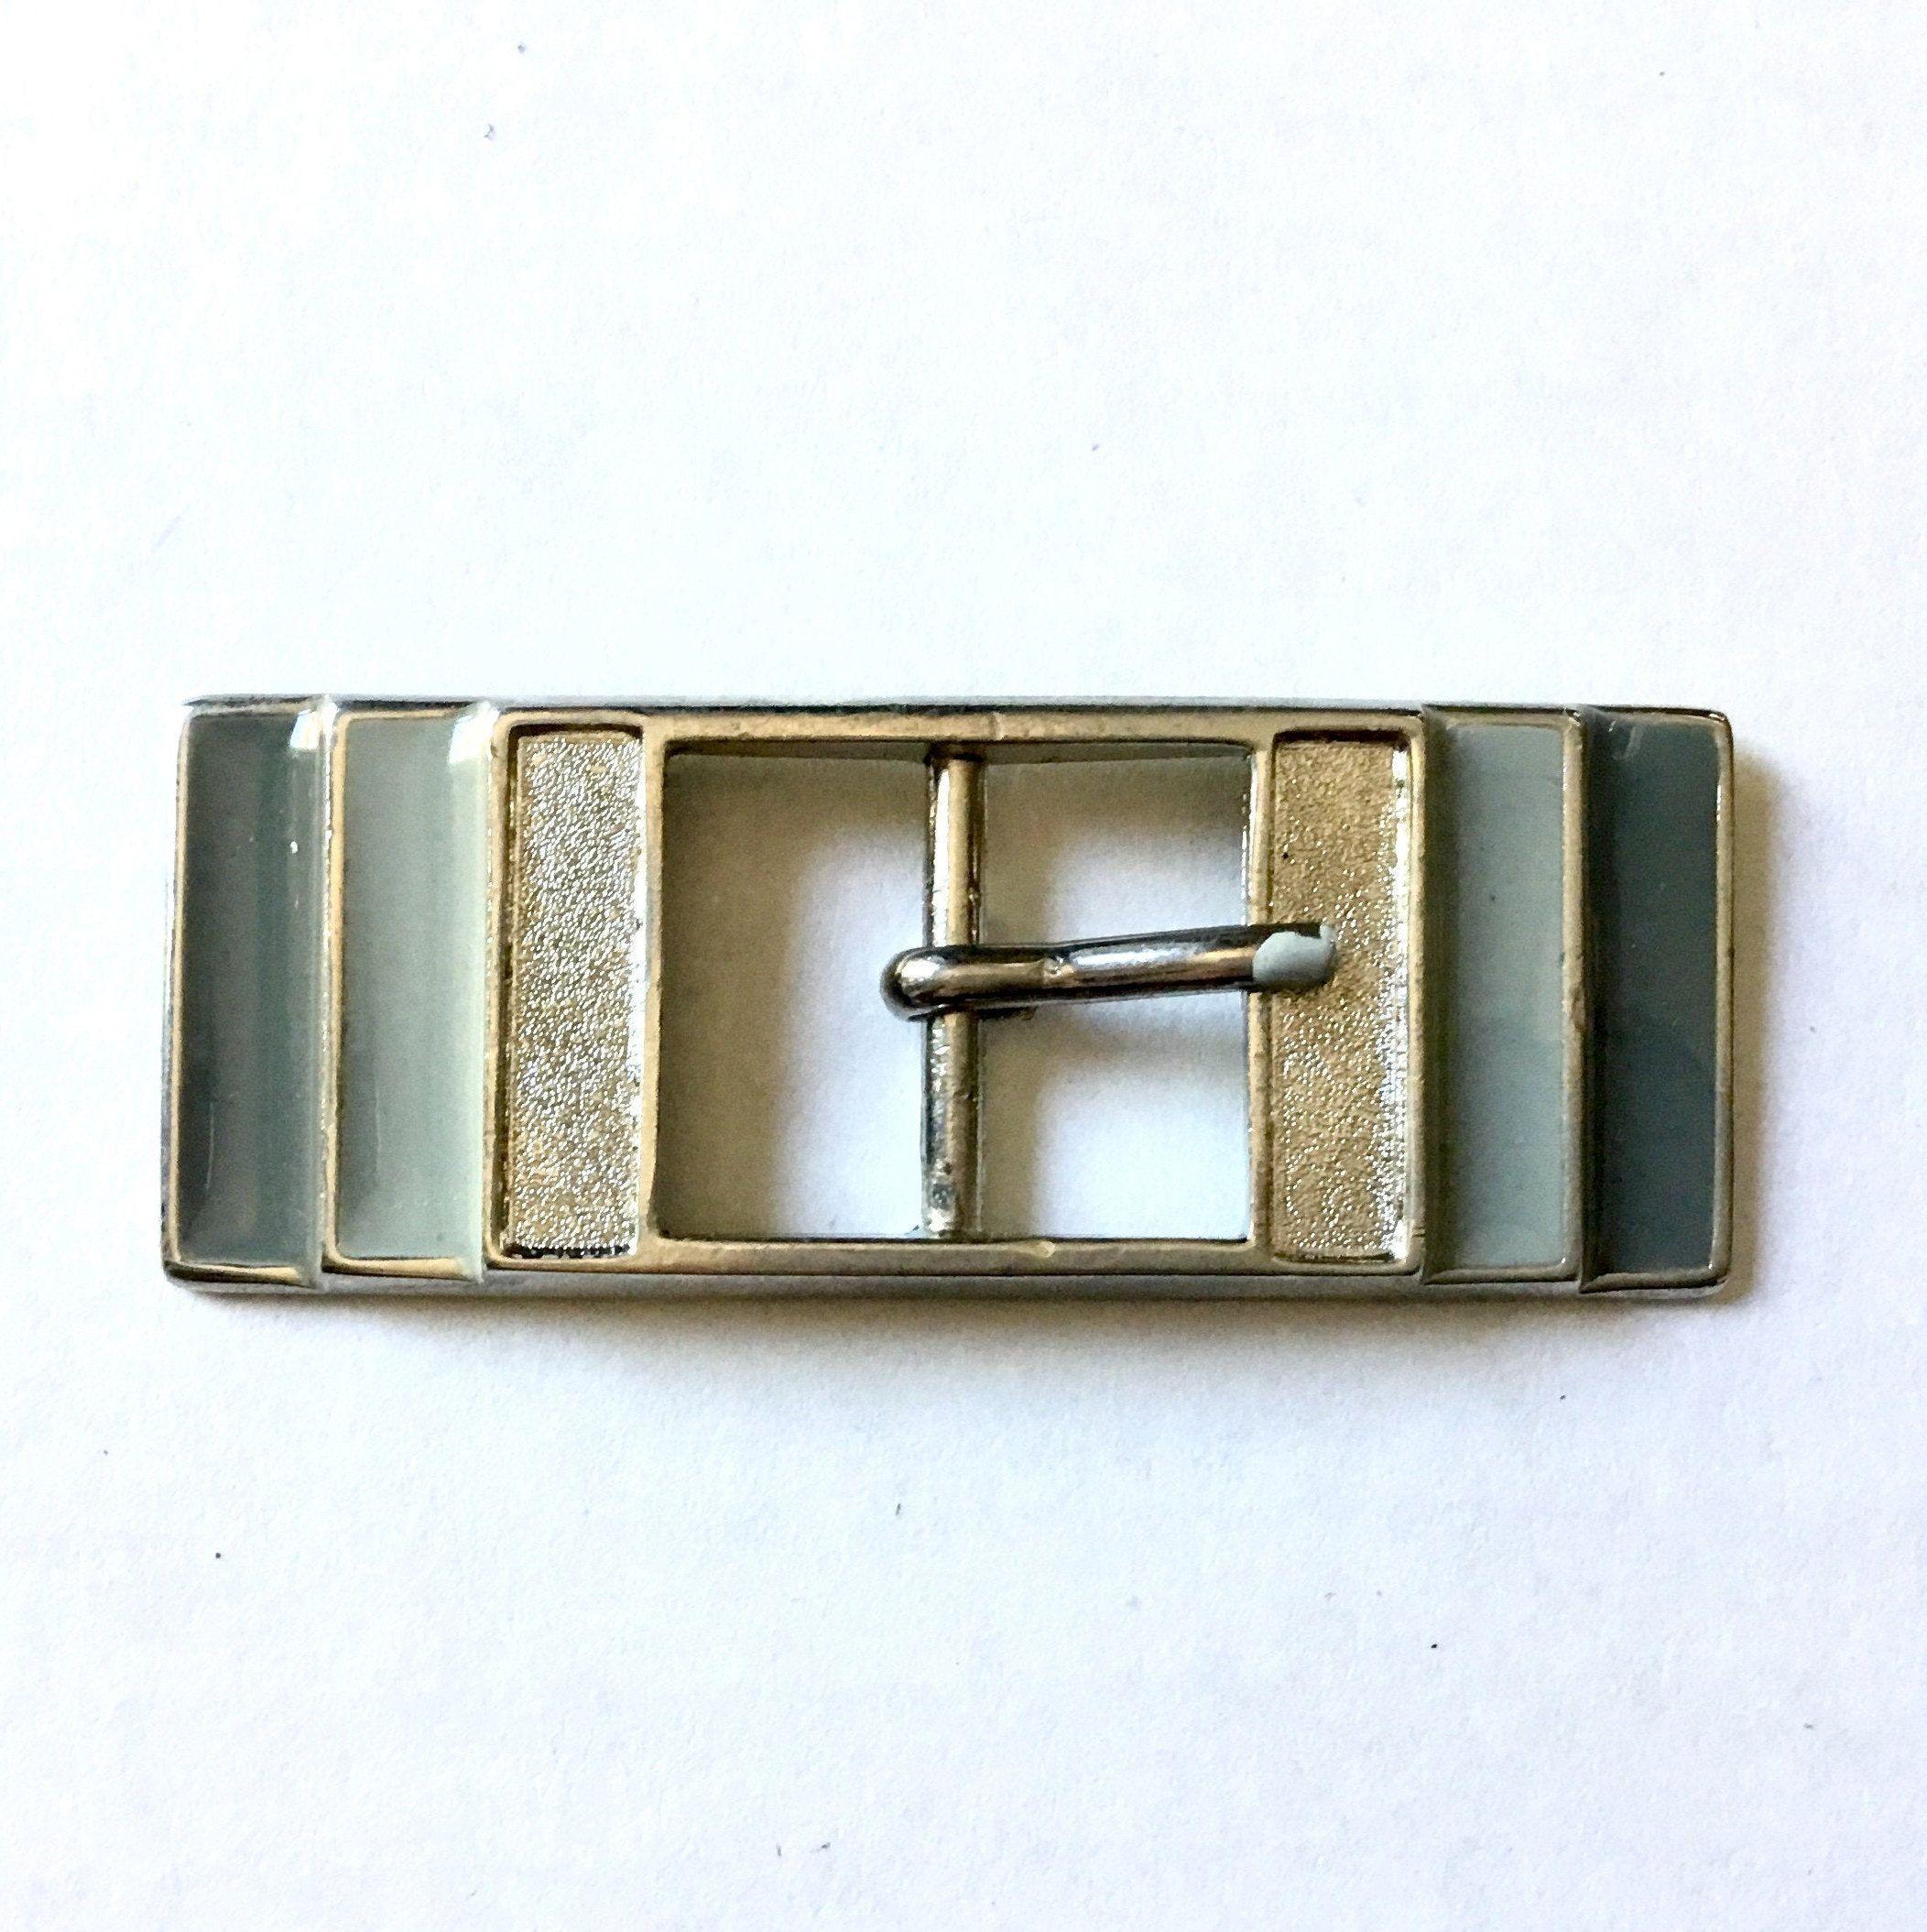 Silver Belt Buckle For Women 70s Rectangular Buckle Retro Etsy Silver Belt Buckle Silver Belts Vintage Belt Buckles